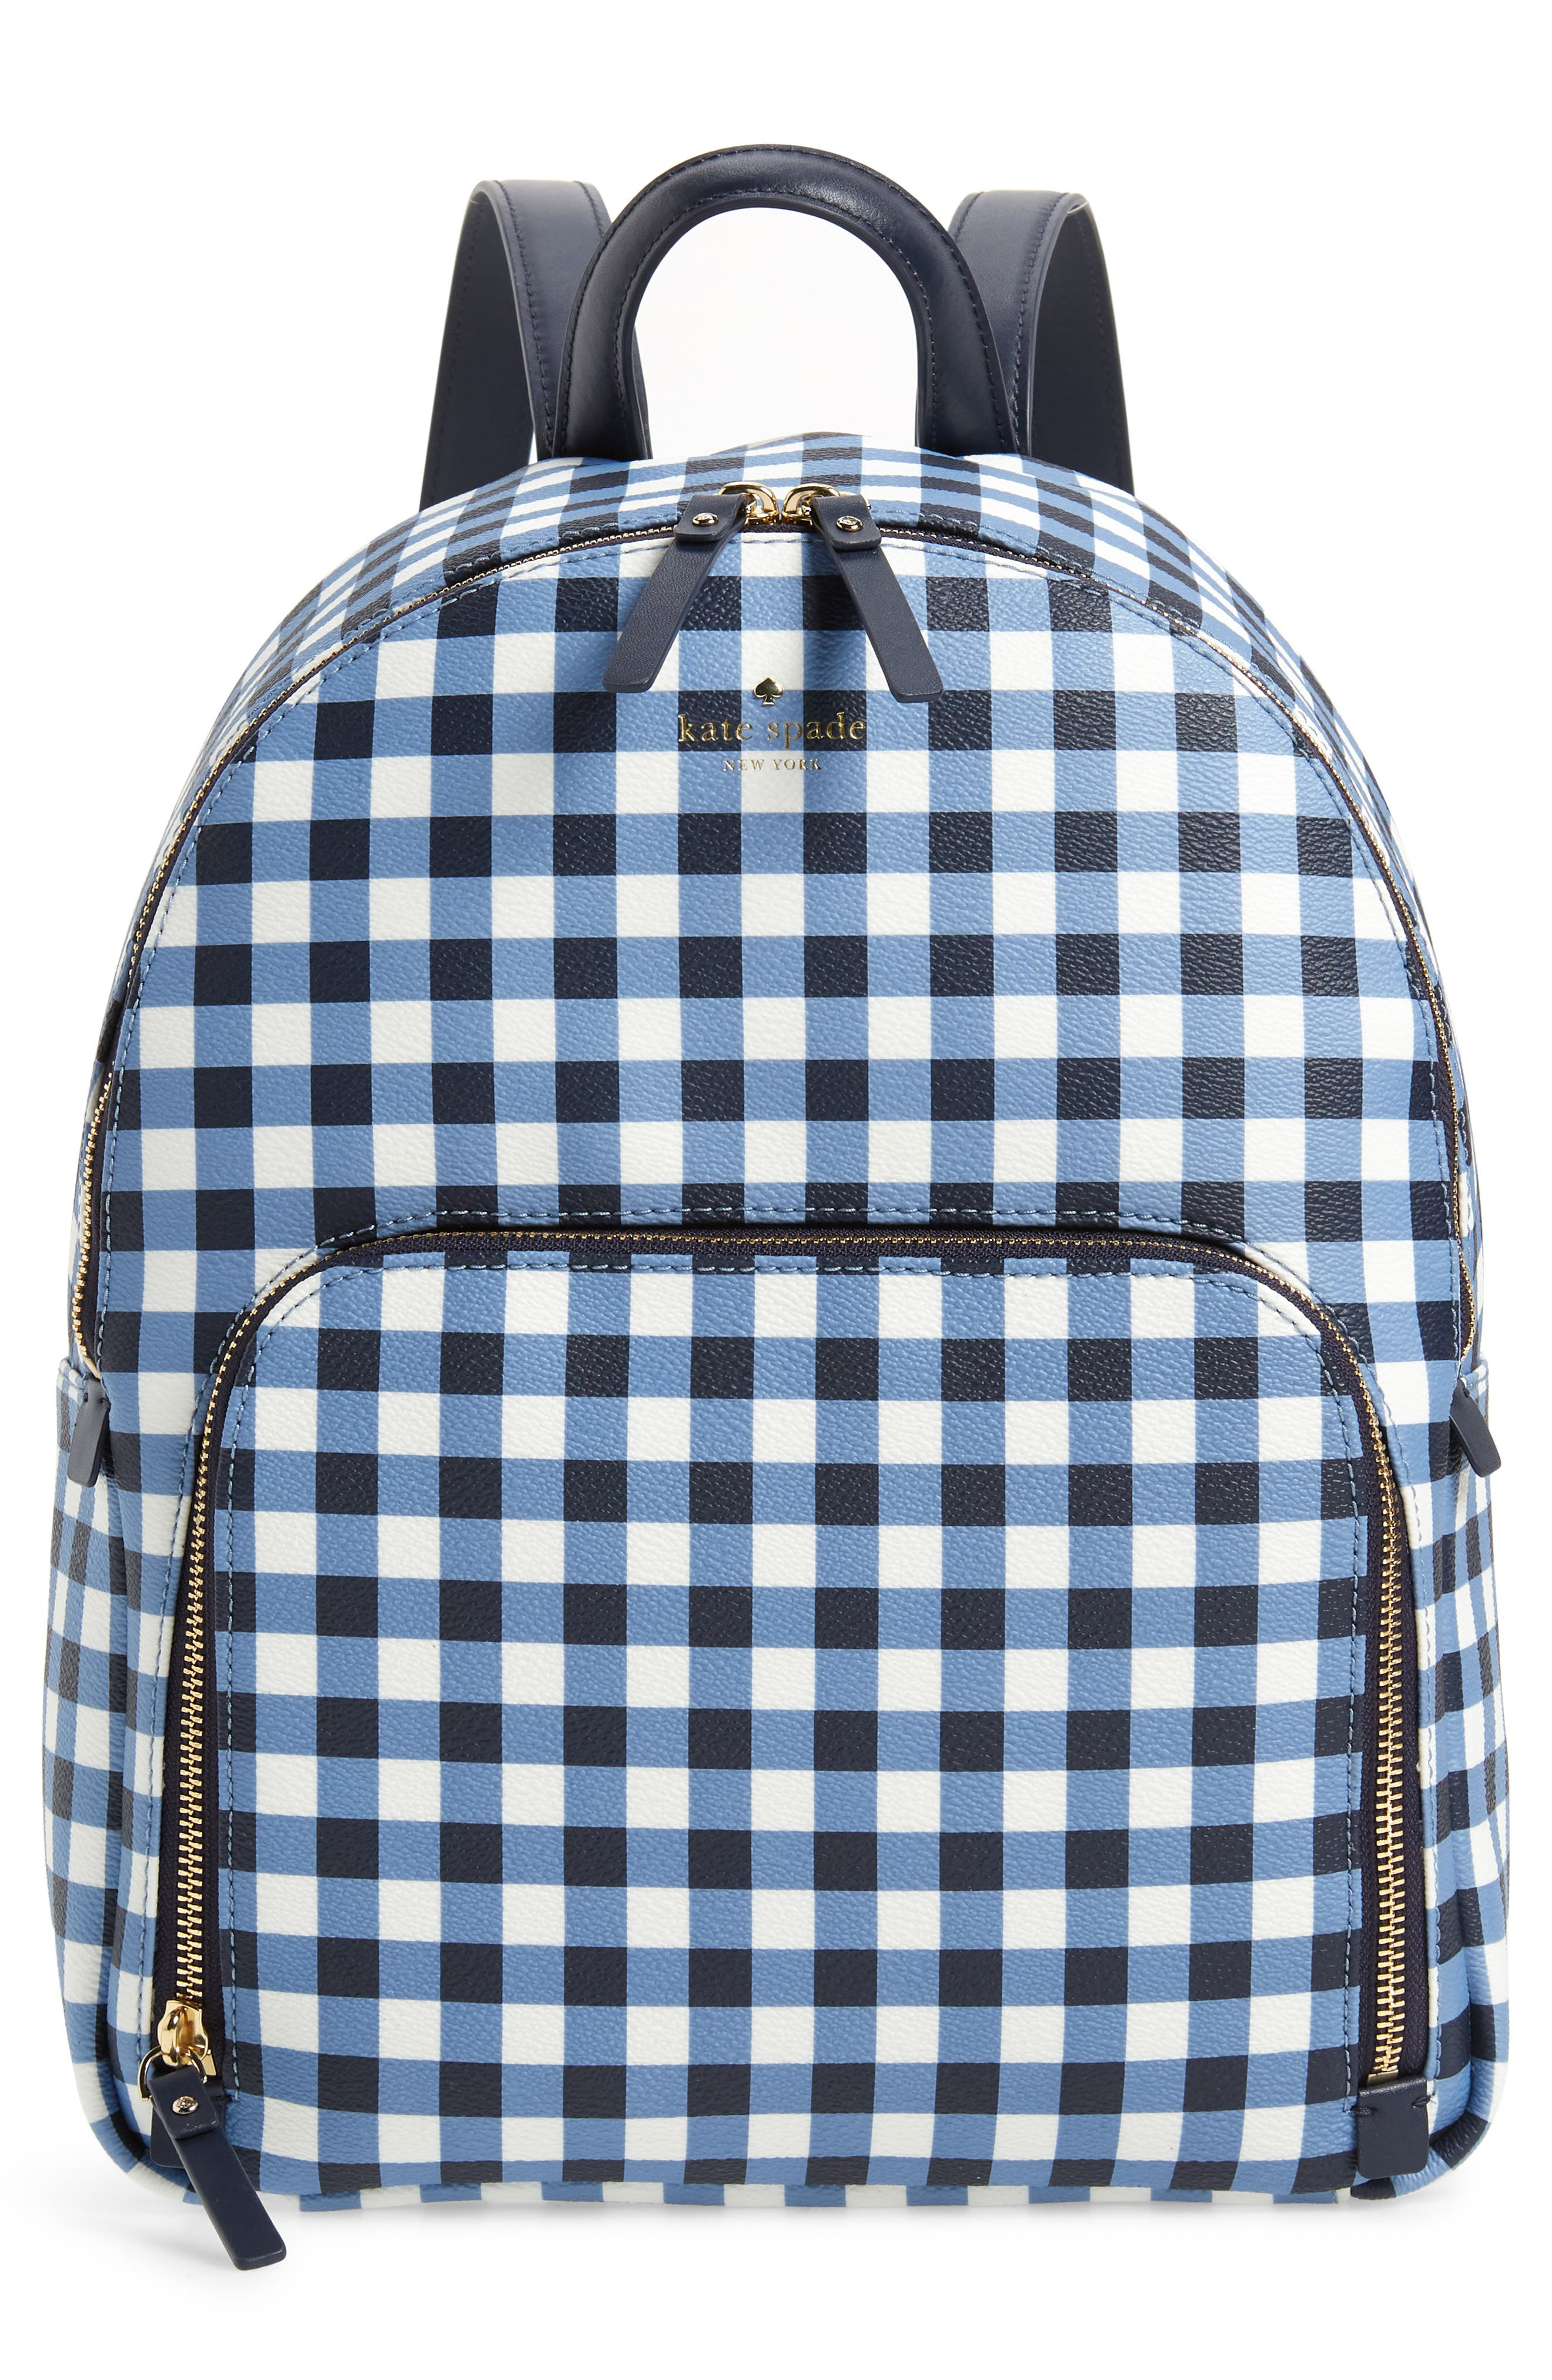 hyde lane hartley gingham backpack,                         Main,                         color, Navy/ White